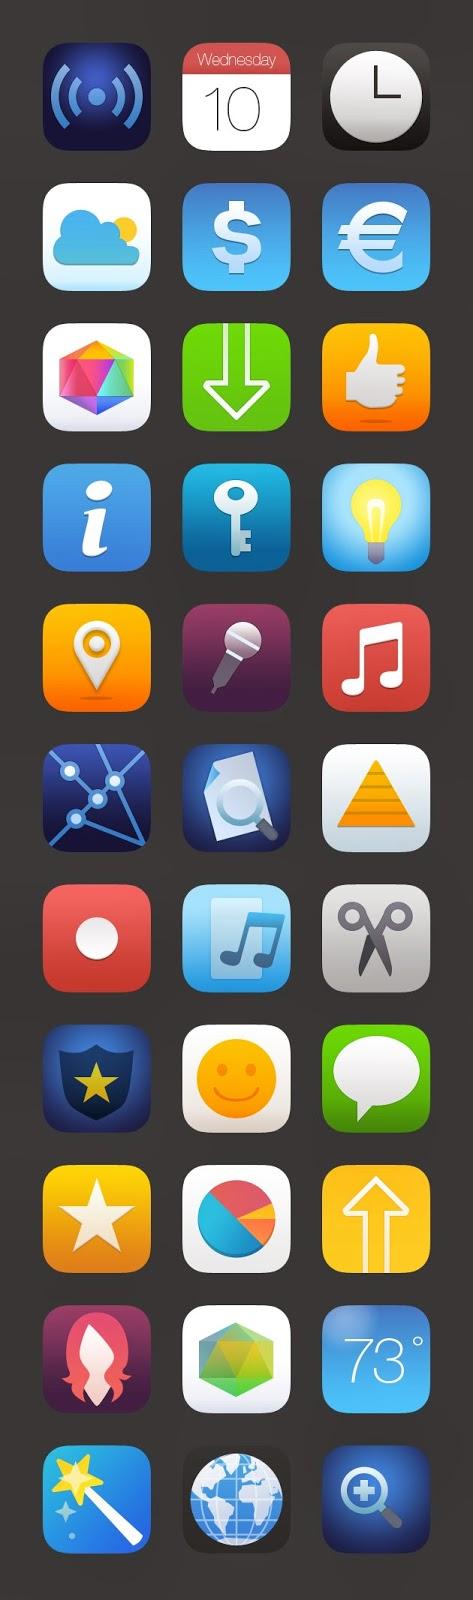 https://3.bp.blogspot.com/-KVFG9m0TidA/UtWv-xoRq7I/AAAAAAAAXLA/zgLJt_Ts5Cs/s1600/flat_app_ios7_icons_144.jpg